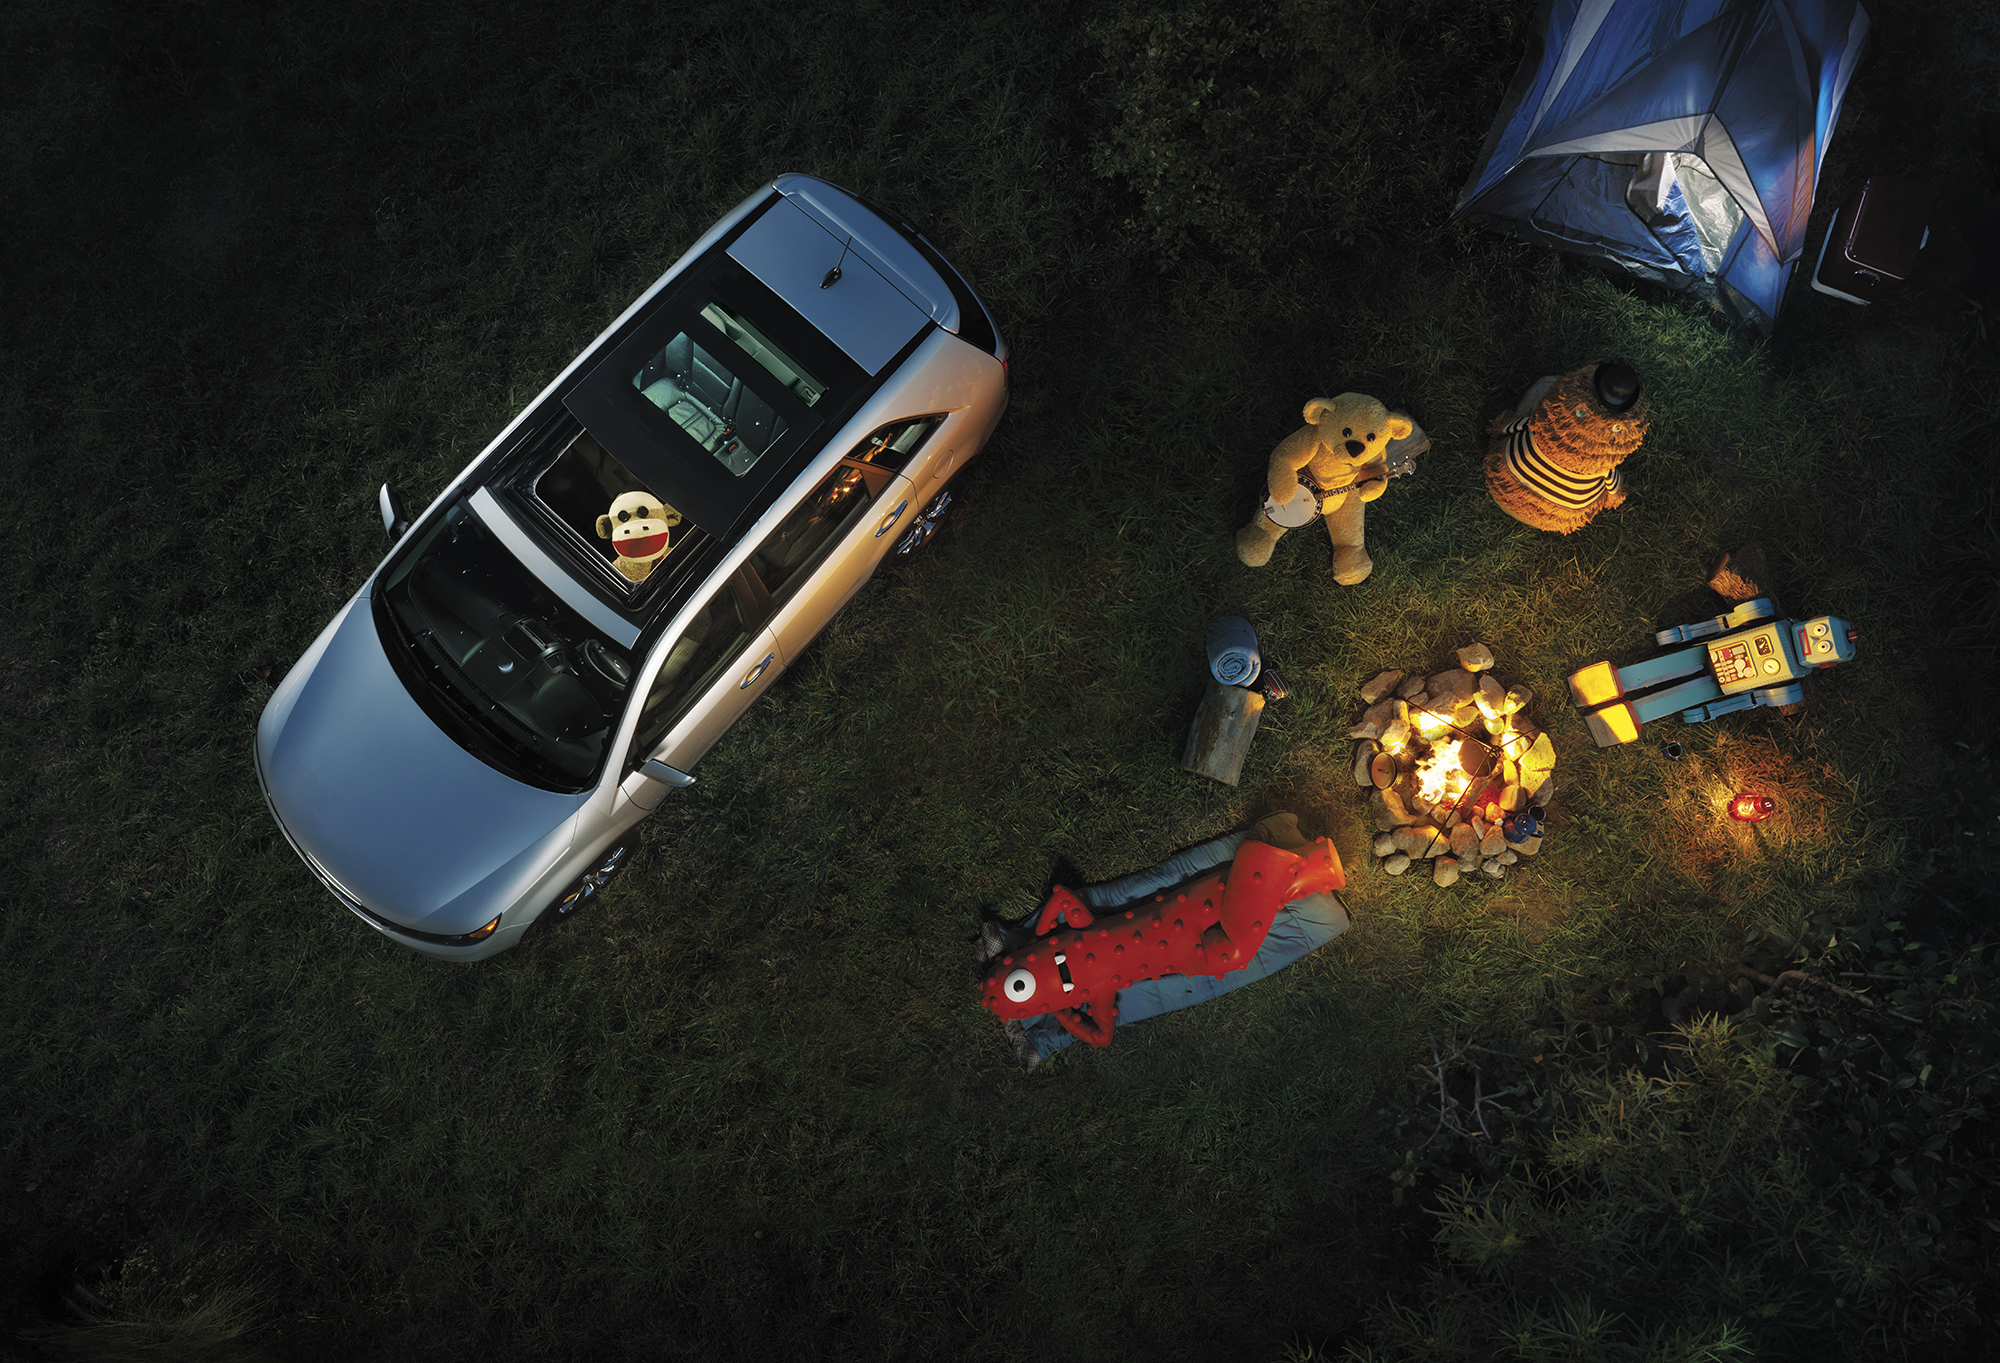 KIA-Camping-3.jpg